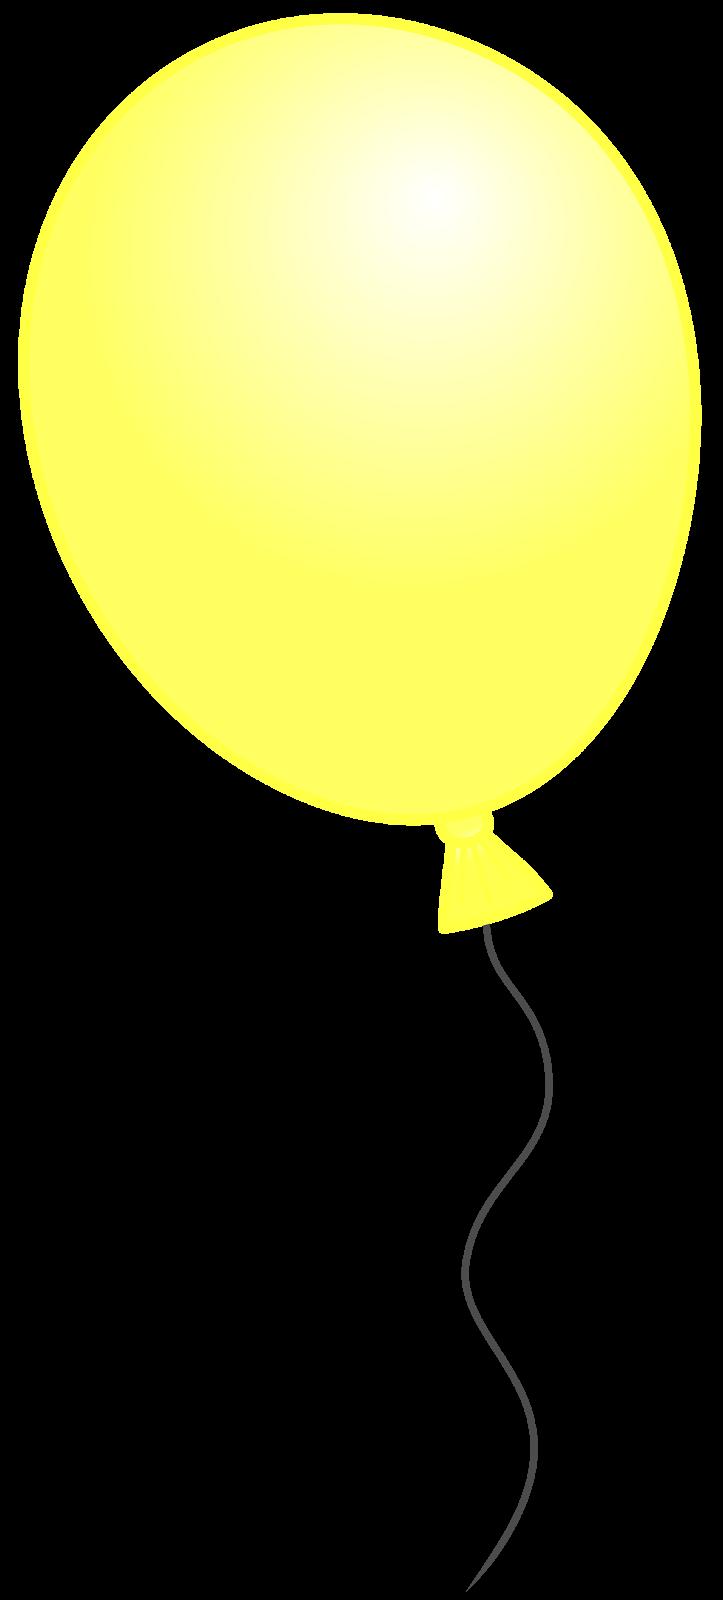 clipart yellow balloons - photo #10